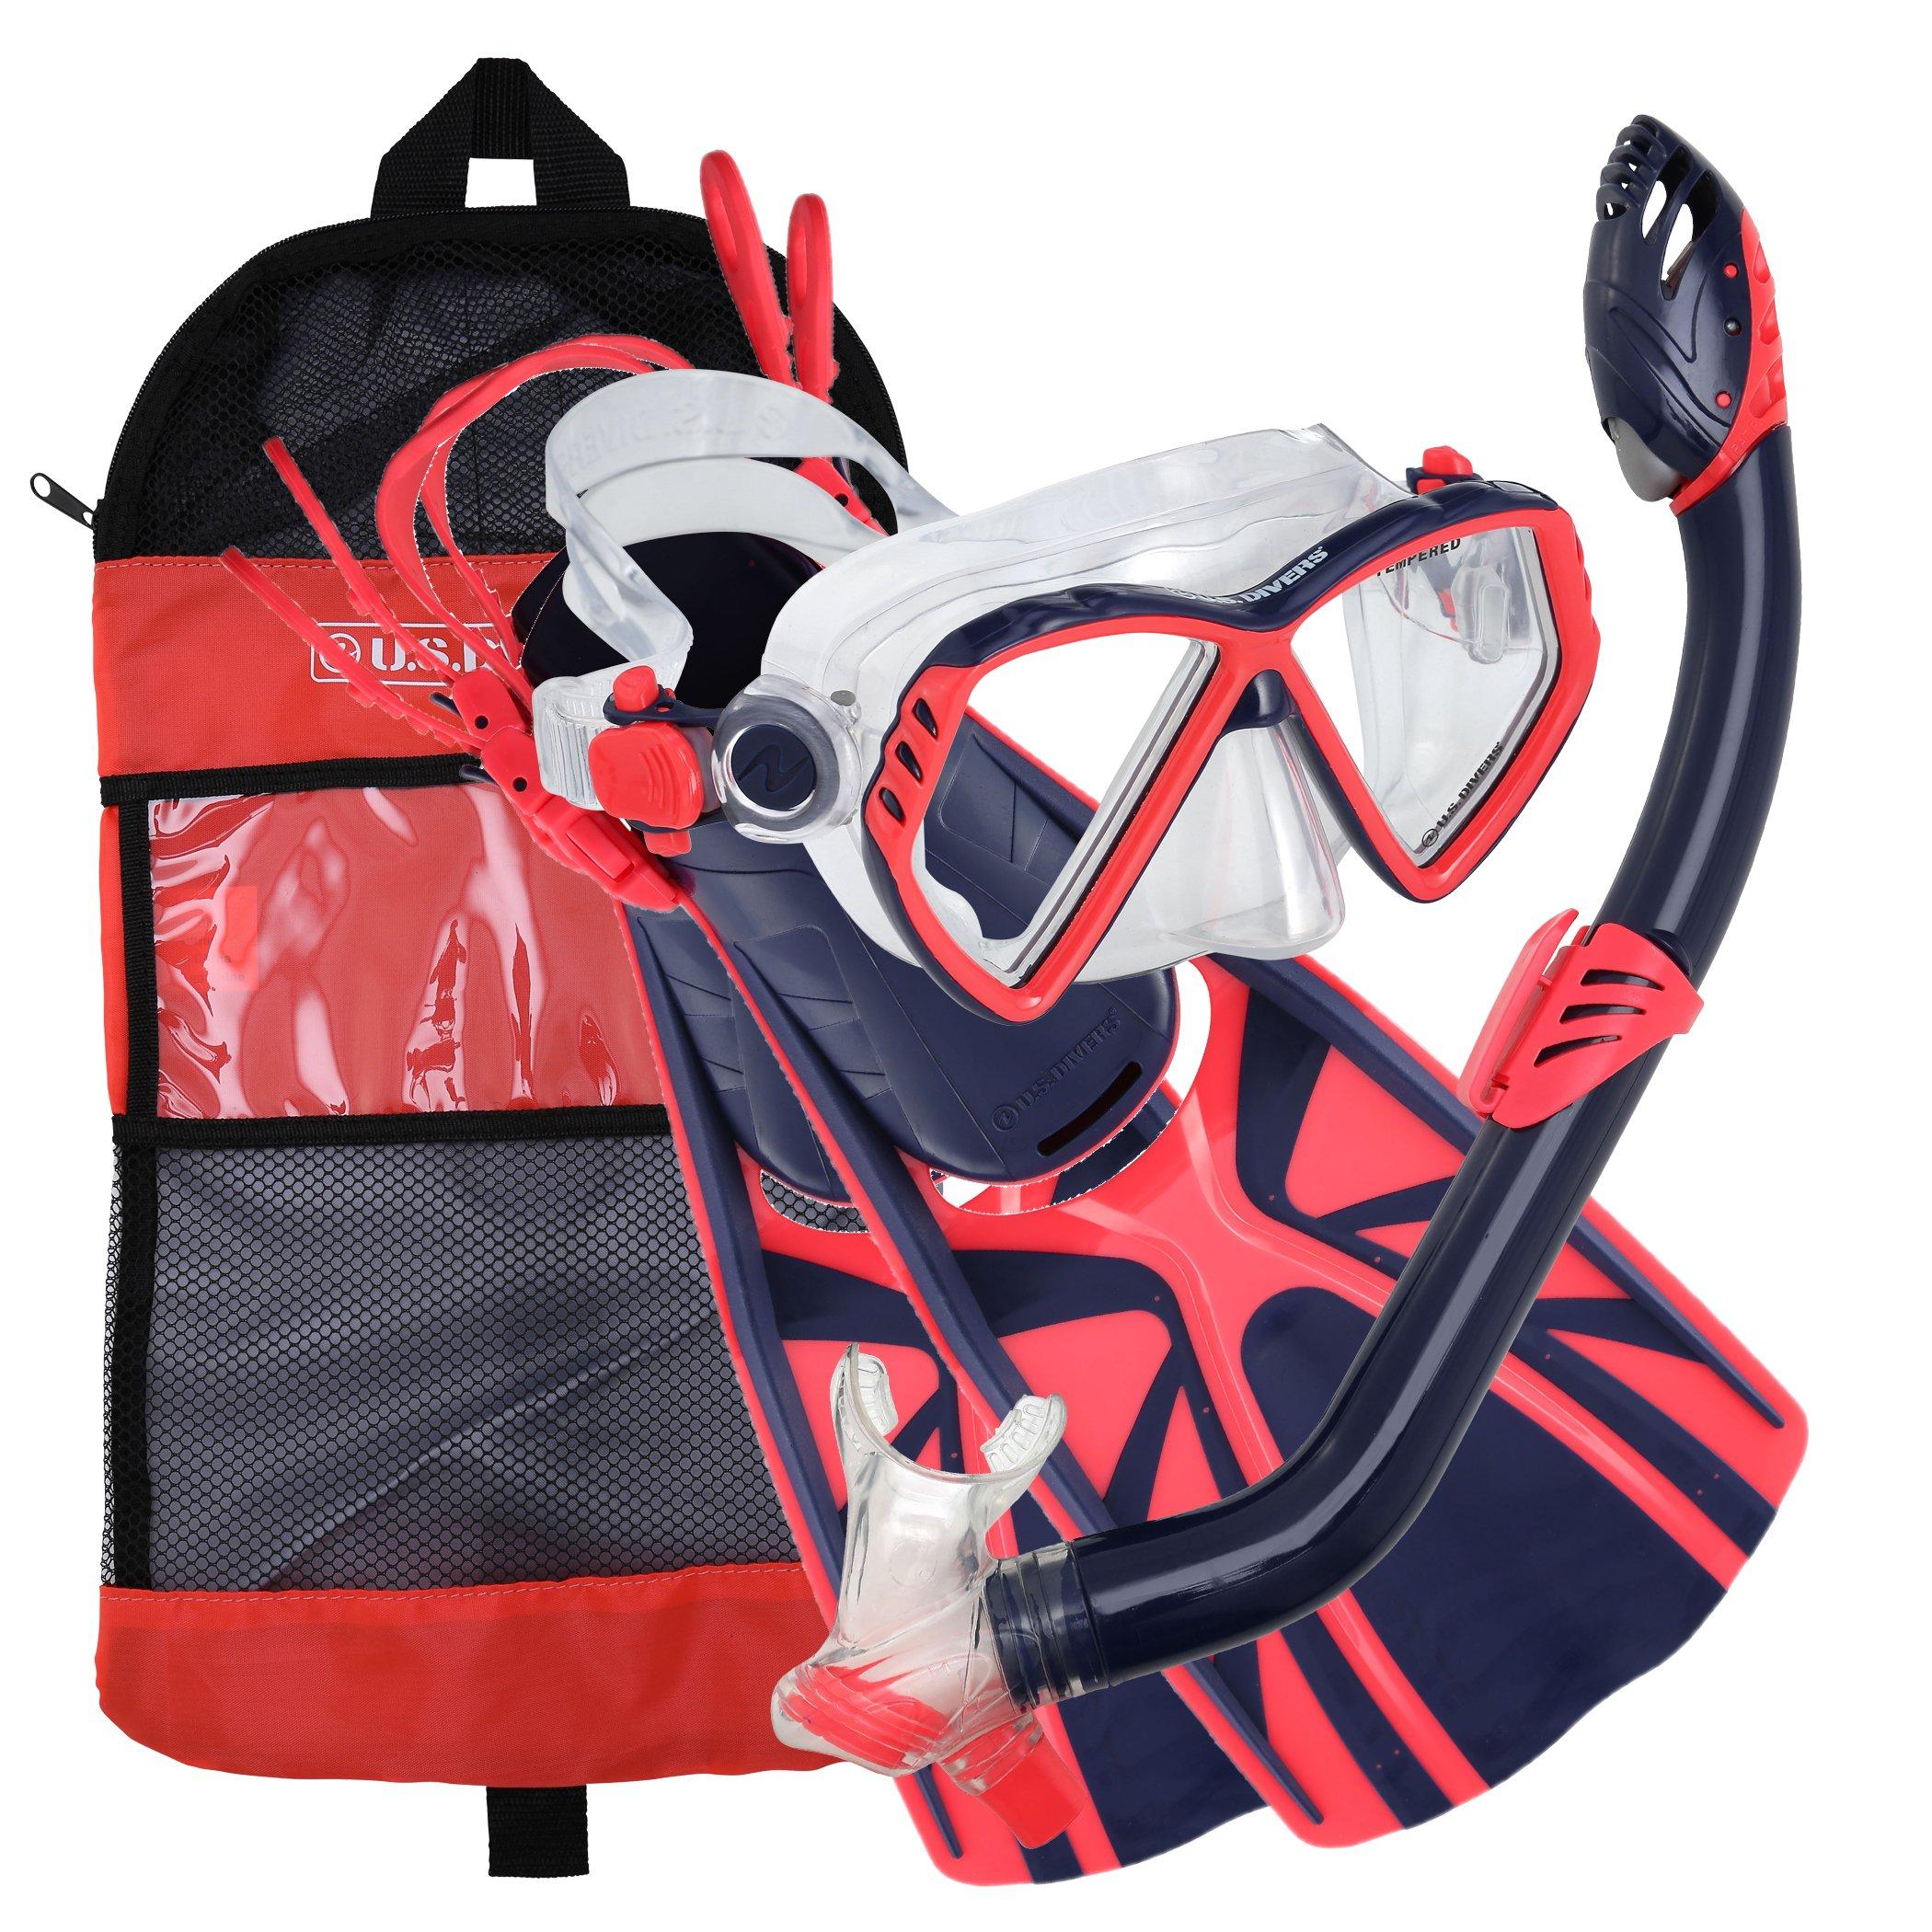 U.S. Divers Regal Jr Mask Laguna Snorkel Lava Fins Set, Large/5-8, Blue by U.S. Divers